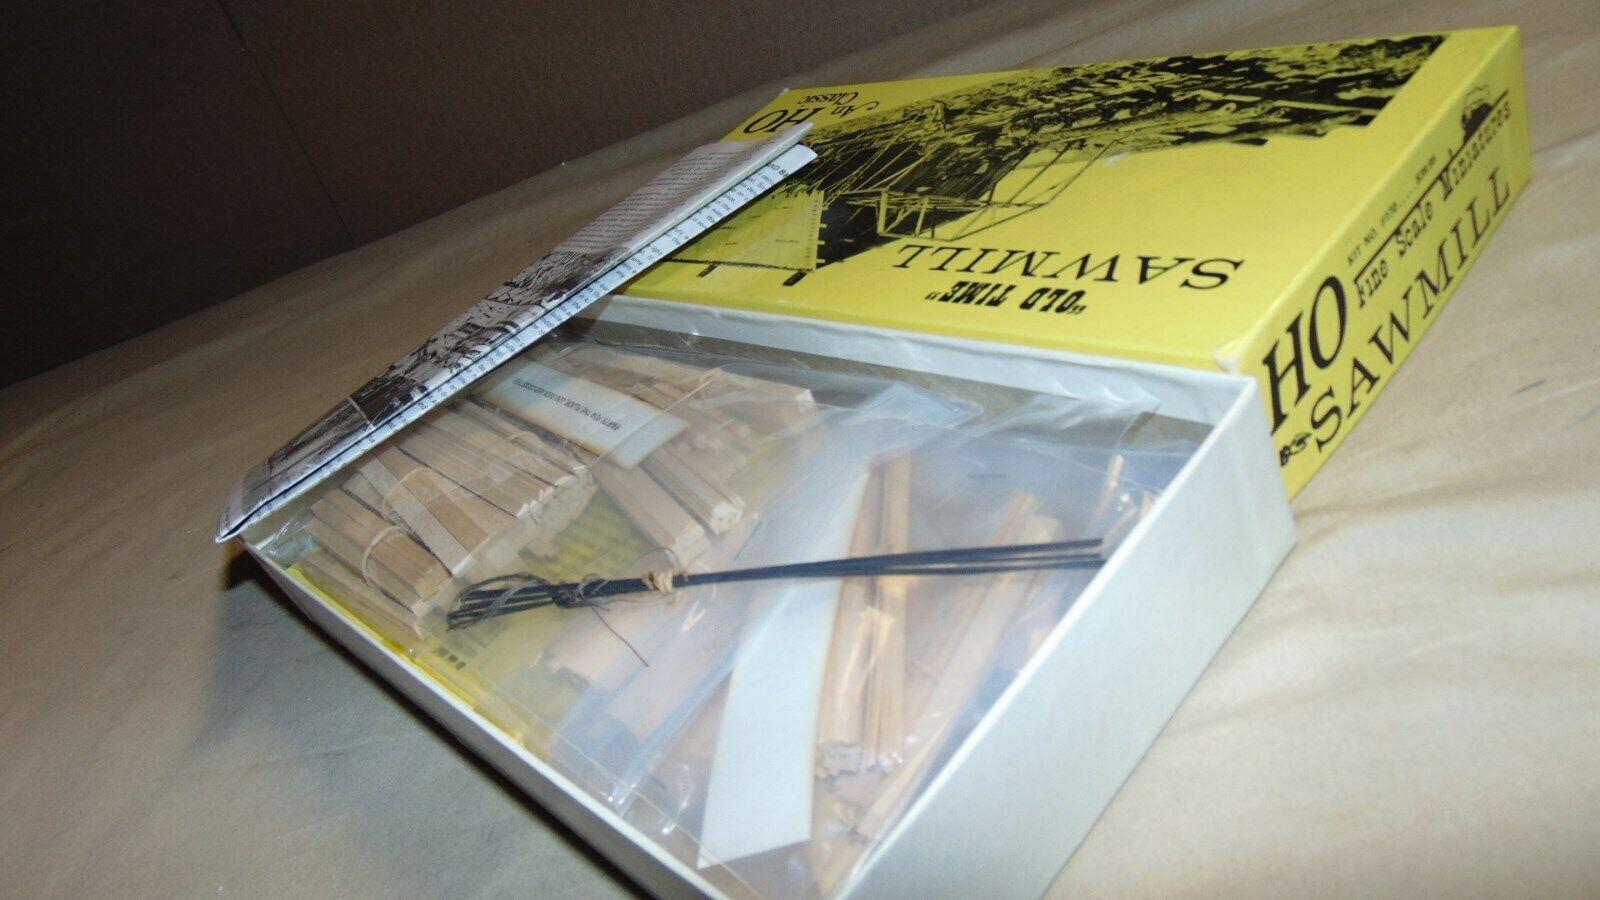 FINE SCALE MINATURES 170 SAWMILL NEW IN ORIGINAL BOX...